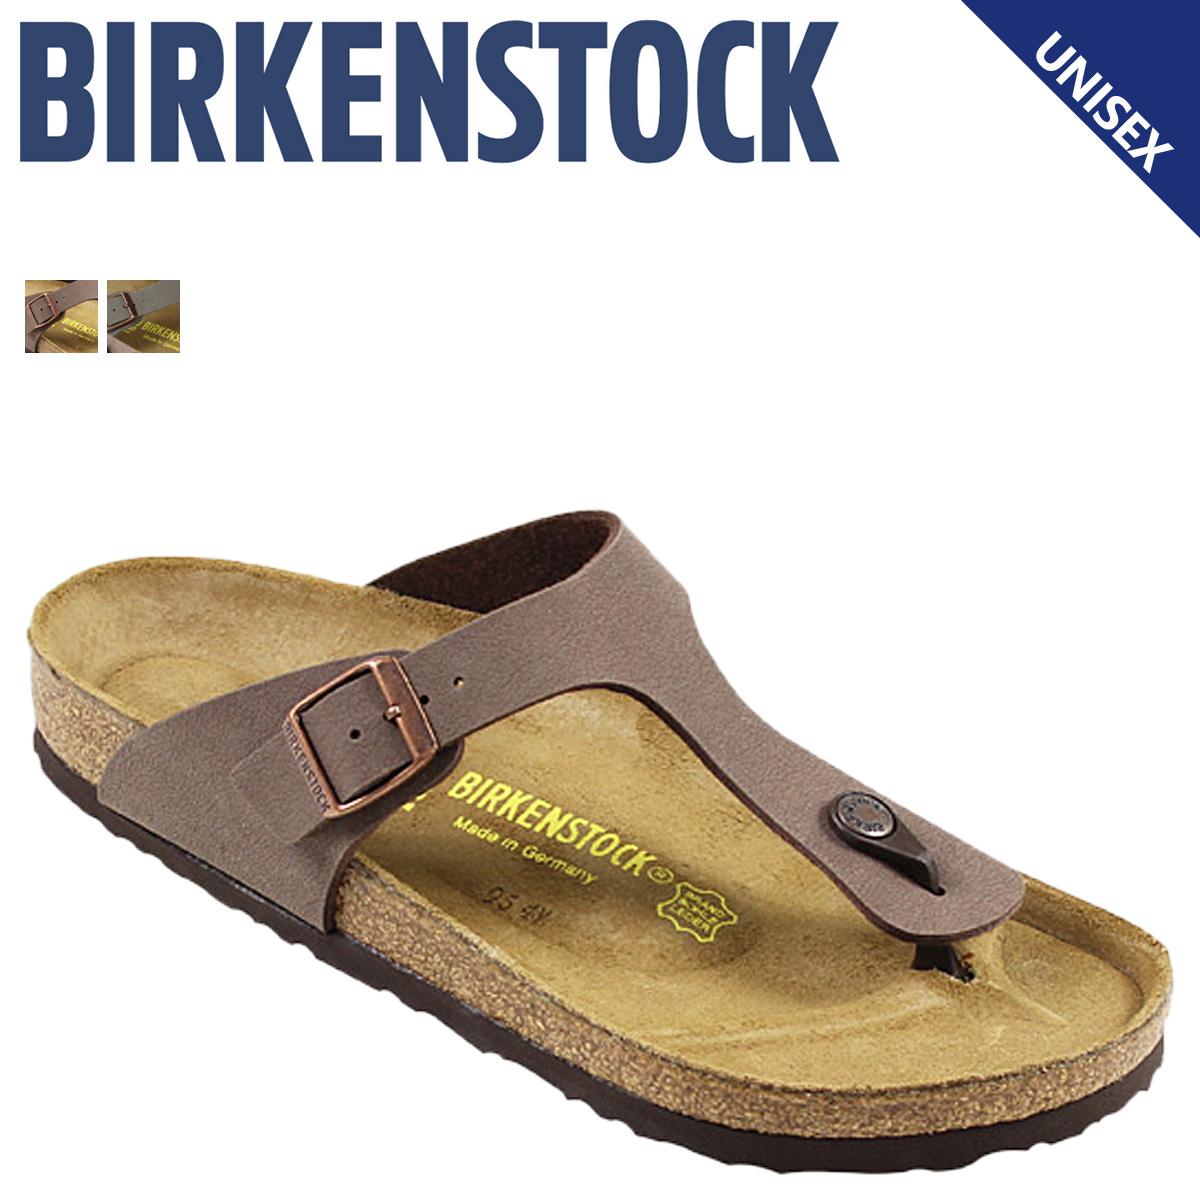 c107452fddee Birkenstock-BIRKENSTOCK guise GIZER  normal width ビルコフロー  stone mens Womens unisex  Sandals  regular